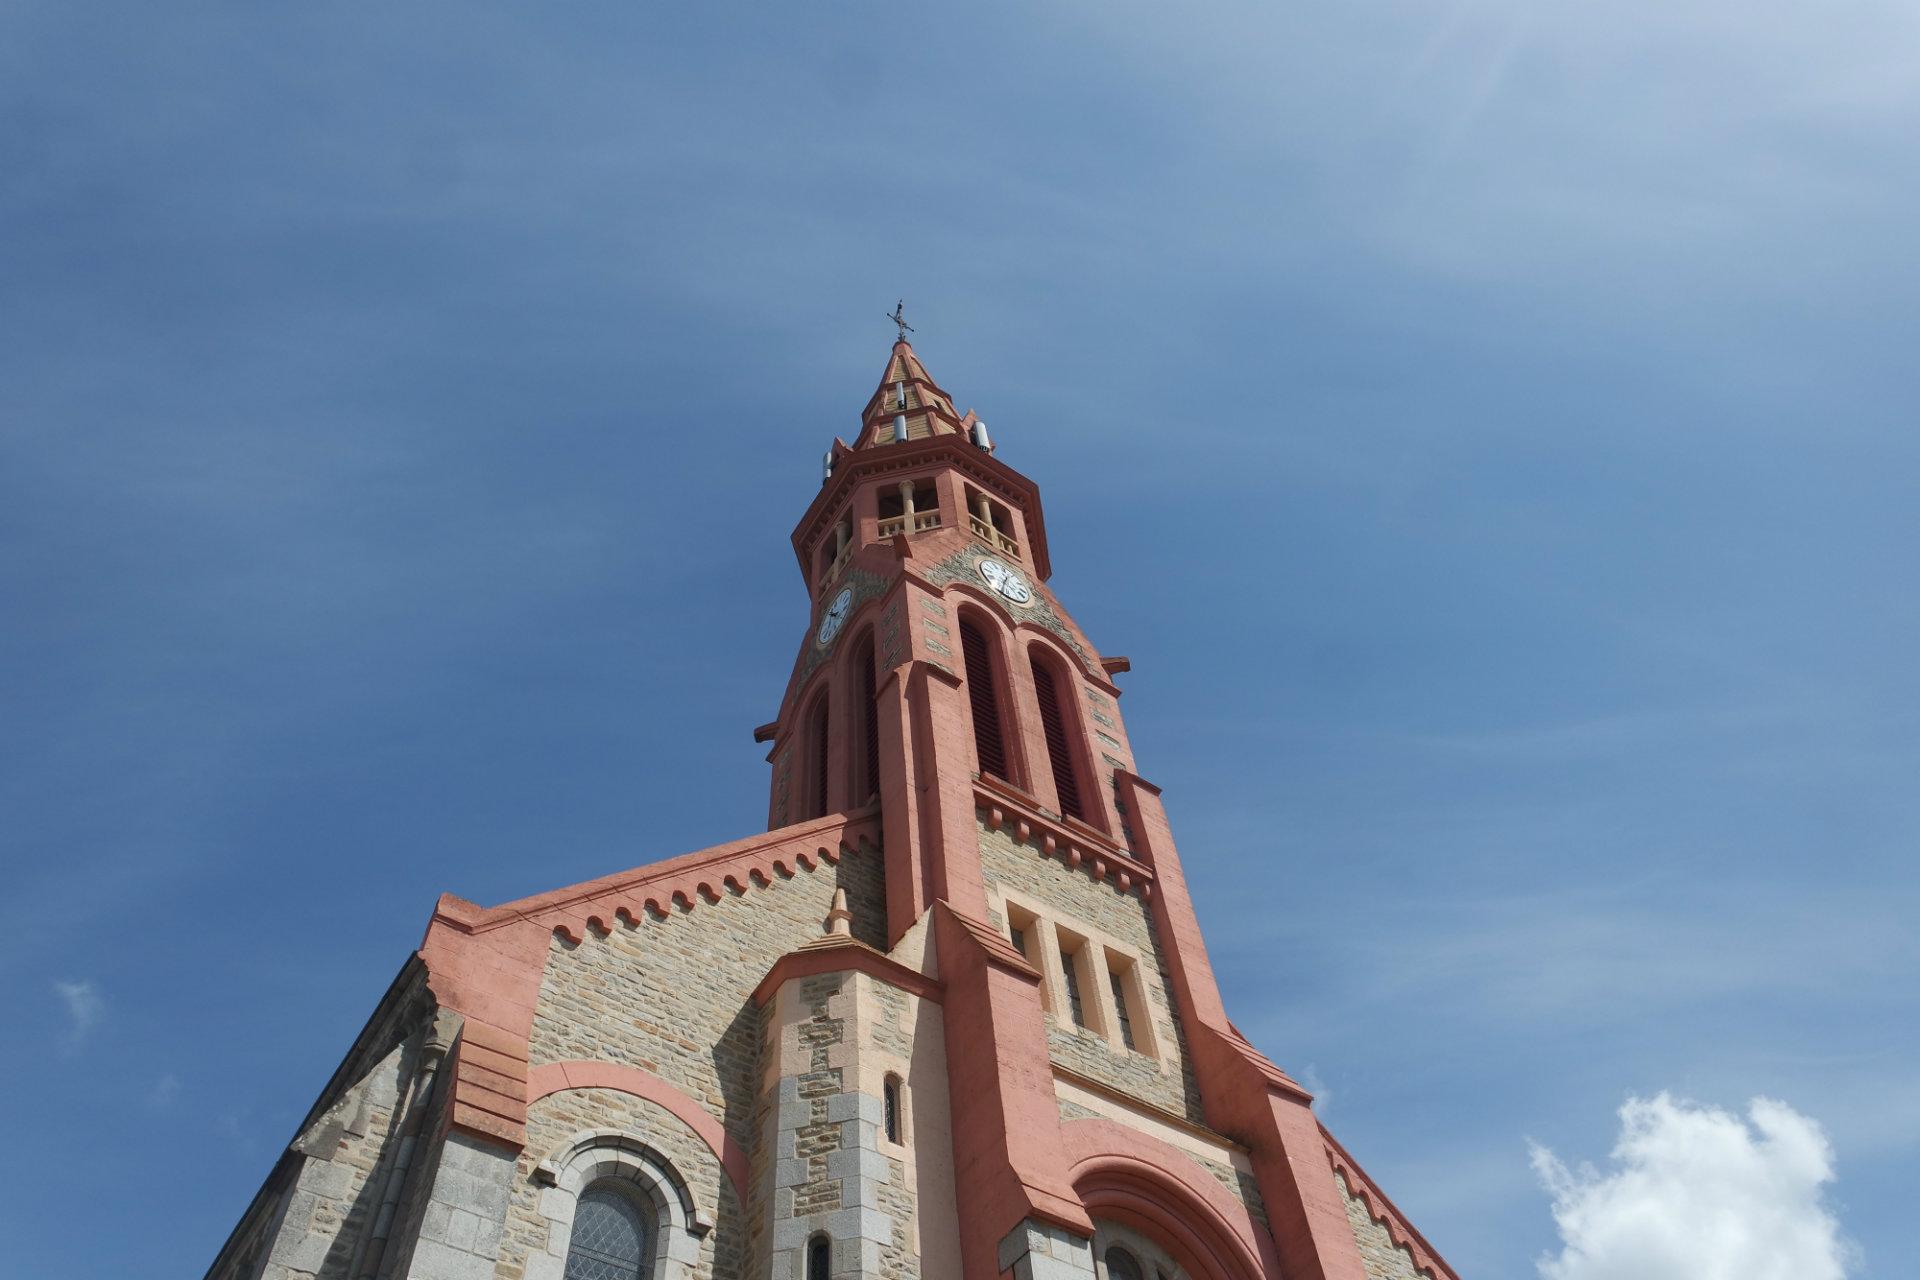 visite-clocher-juillet-2017-destination-bretagne-plein-sud-2-1212806